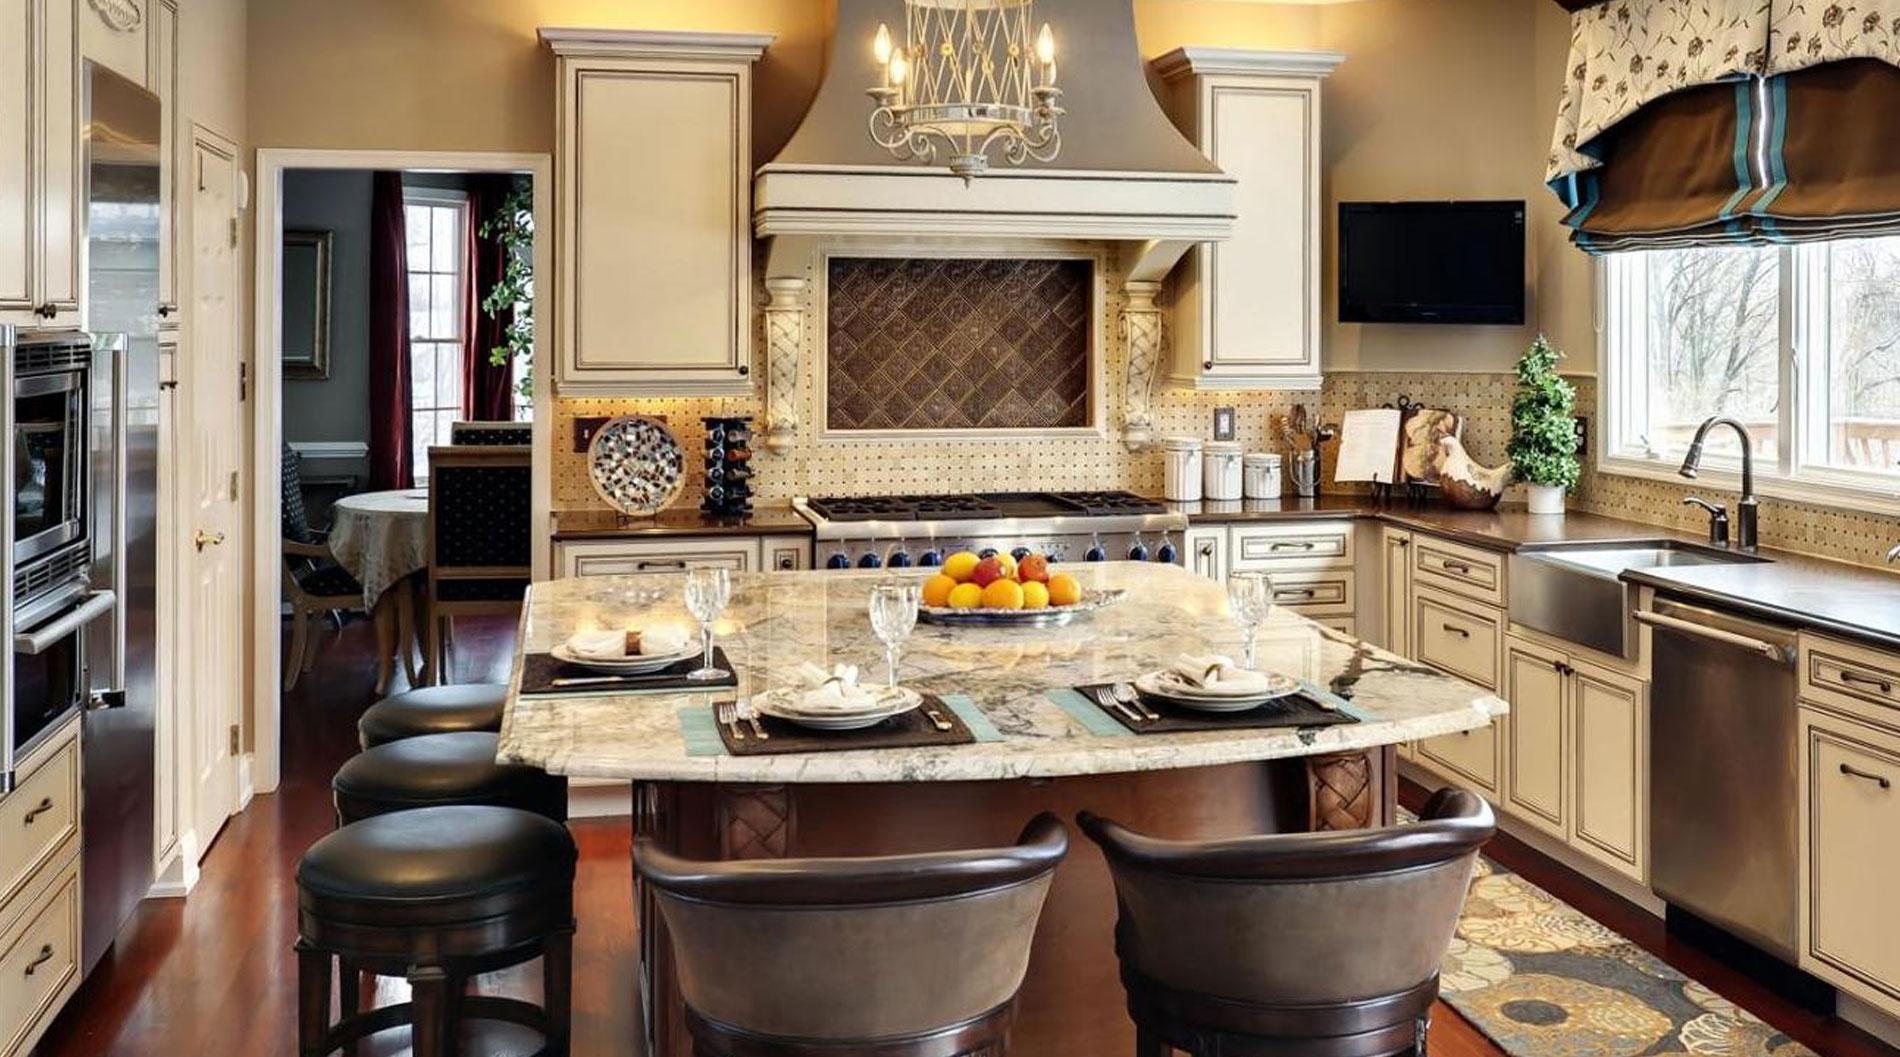 Kitchen Cabinet Hardware Kelowna Bc • Patio Ideas